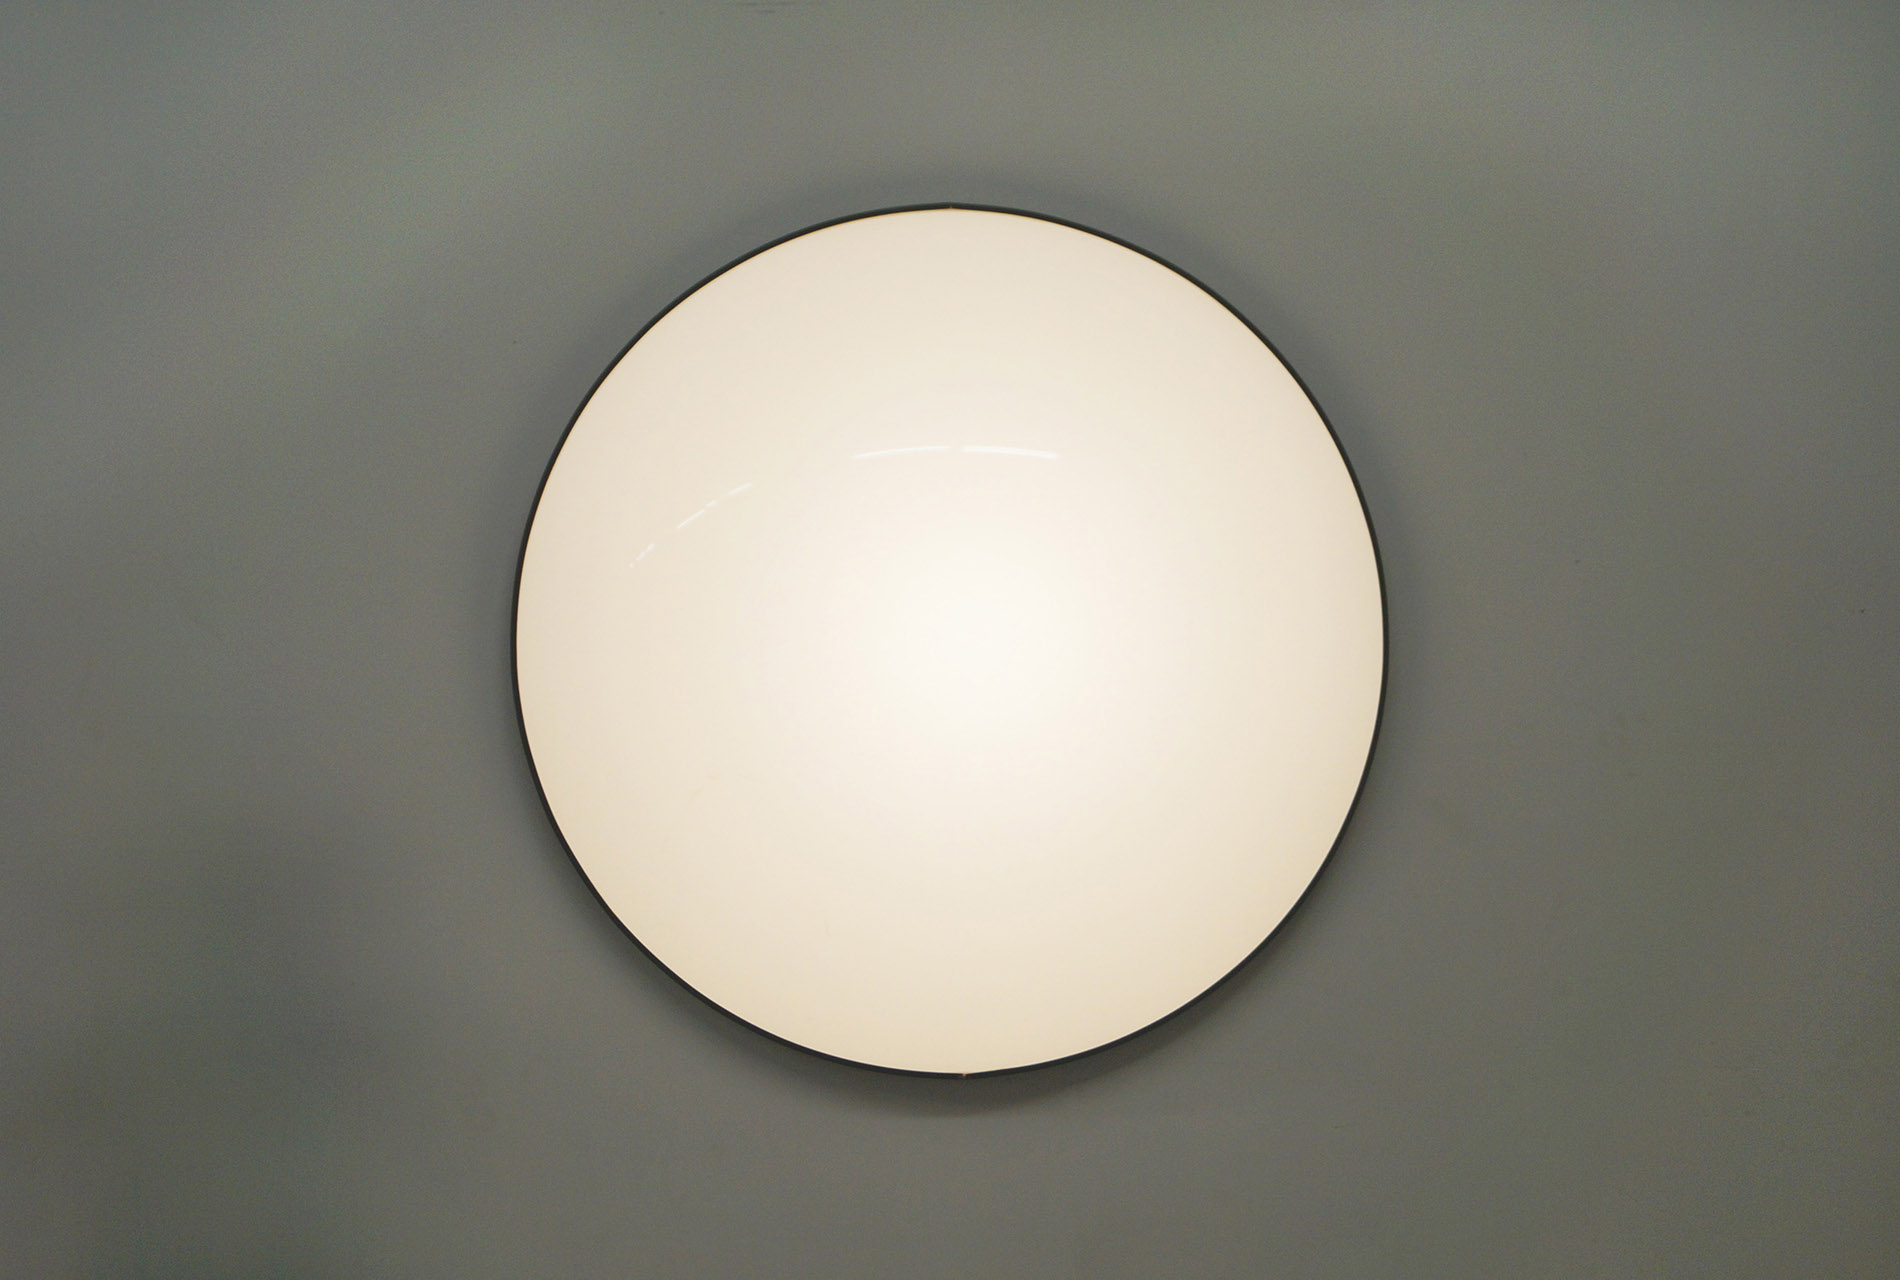 Vintage Wall Mounted Moon Light by Aquarius Mirrorworks